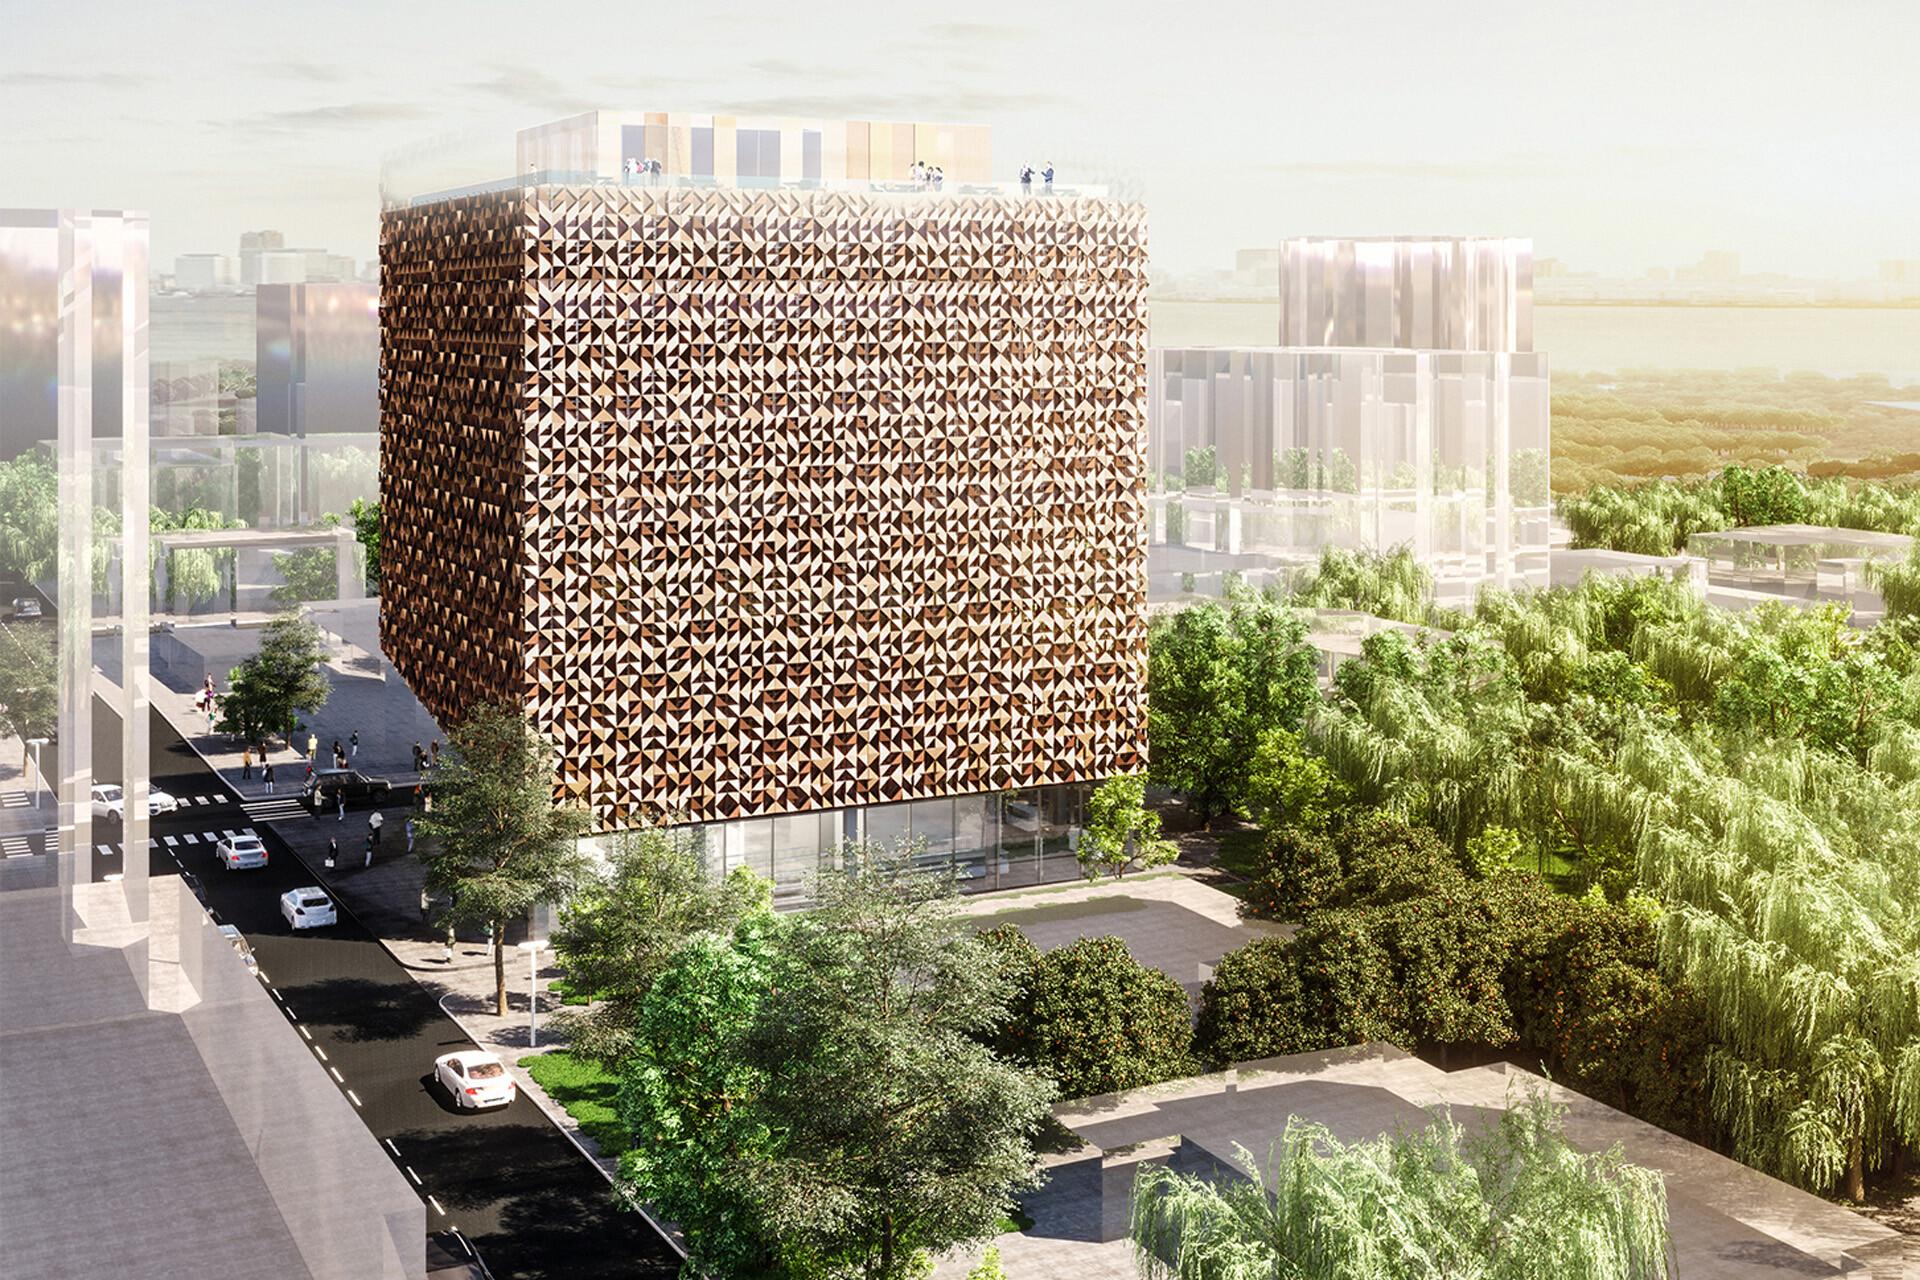 Blloku Cube Tirana Albania SCE Project